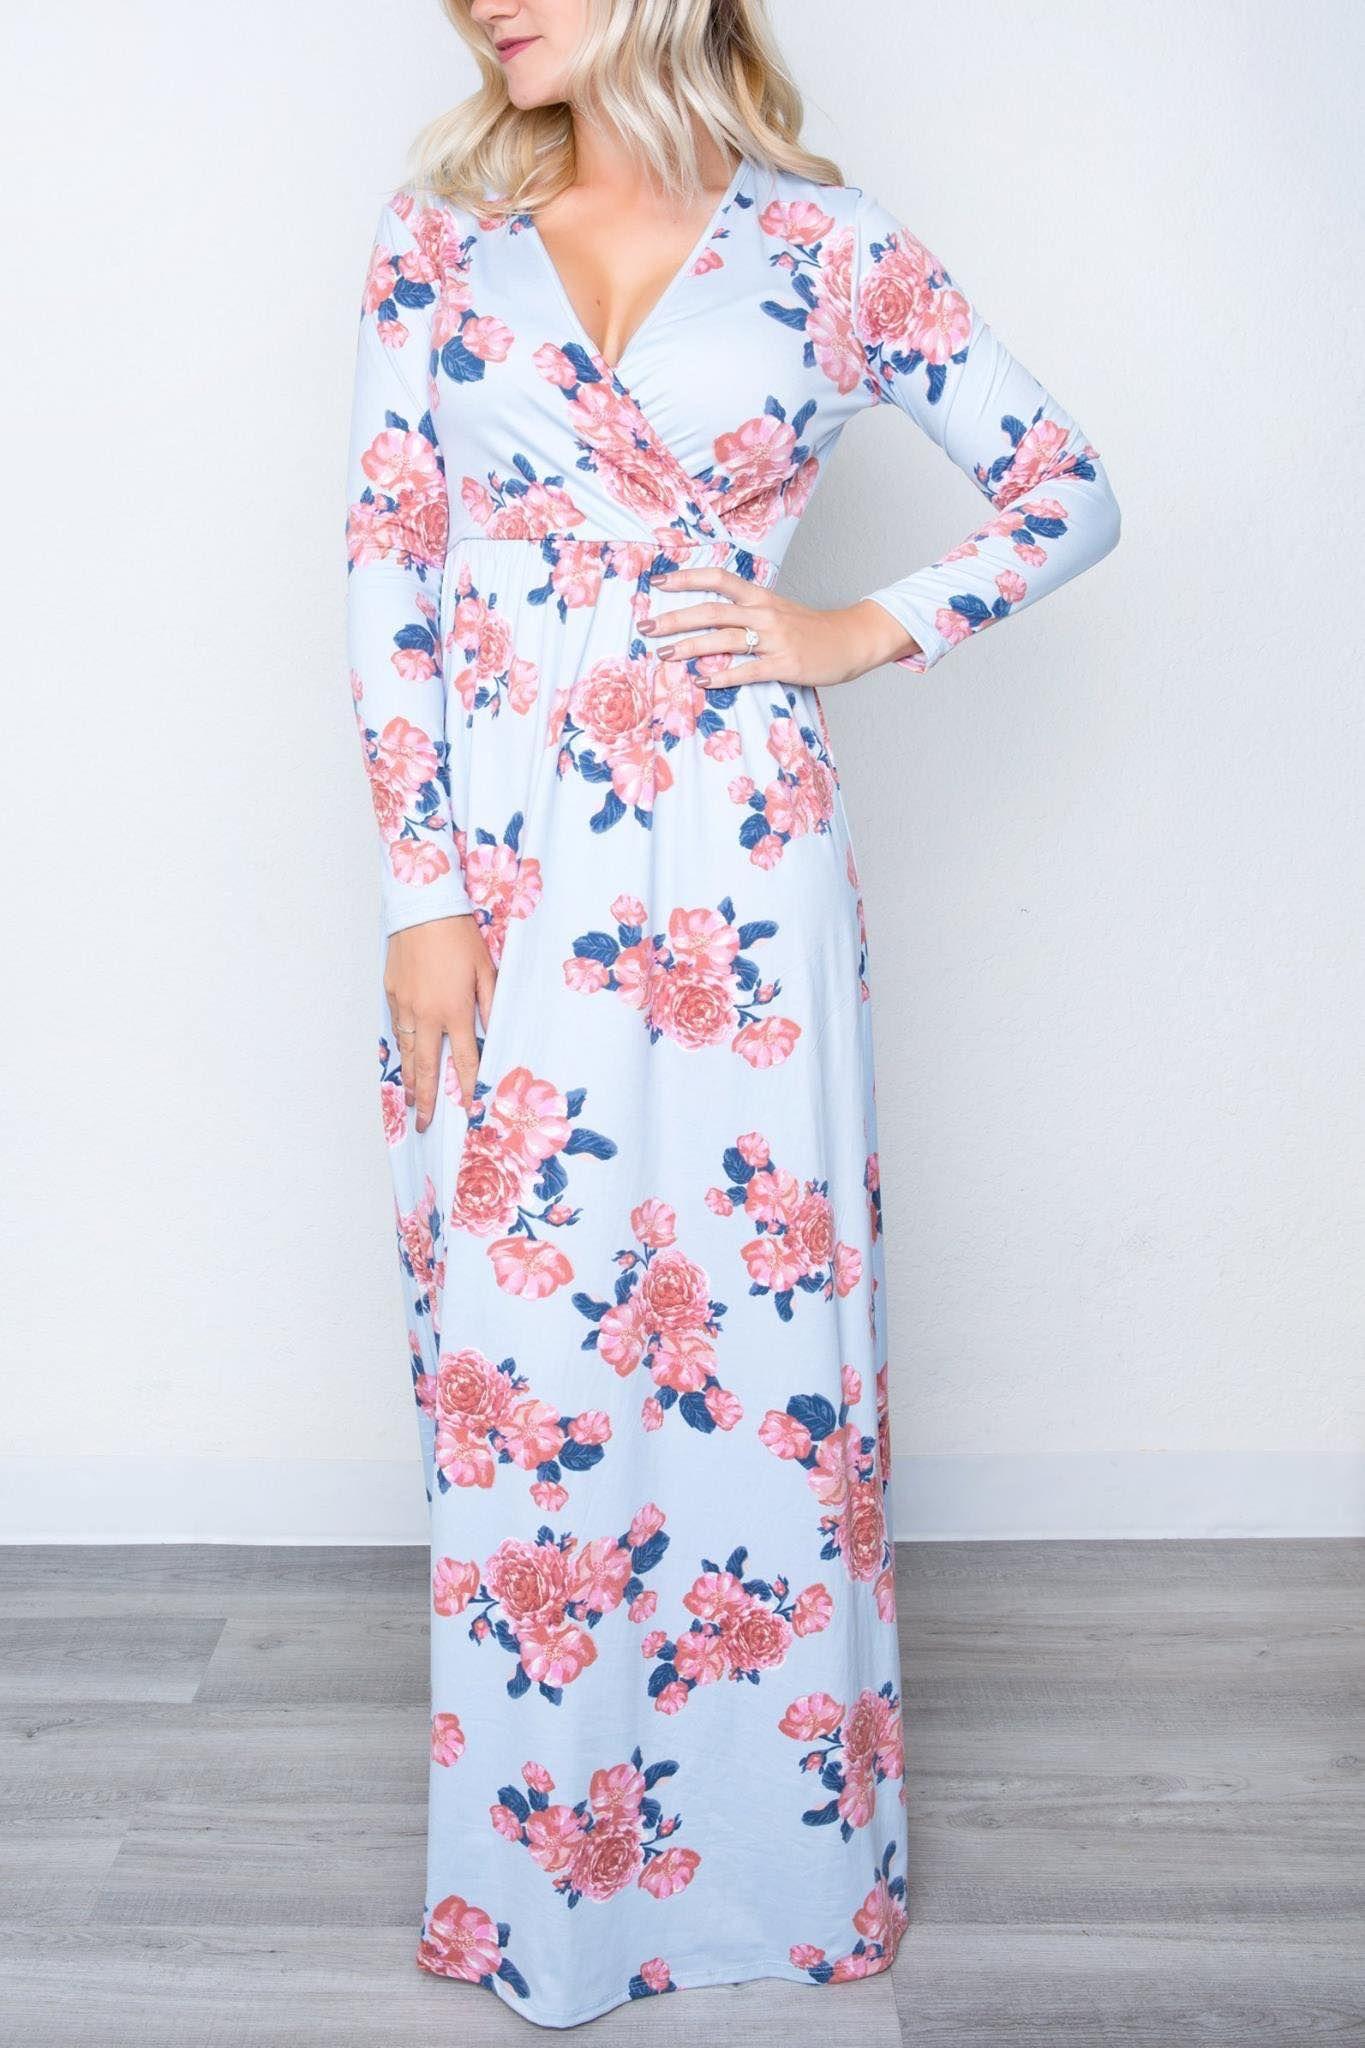 Amelia James Saratoga Maxi Dress Faux Wrap Floor Length Long Sleeve